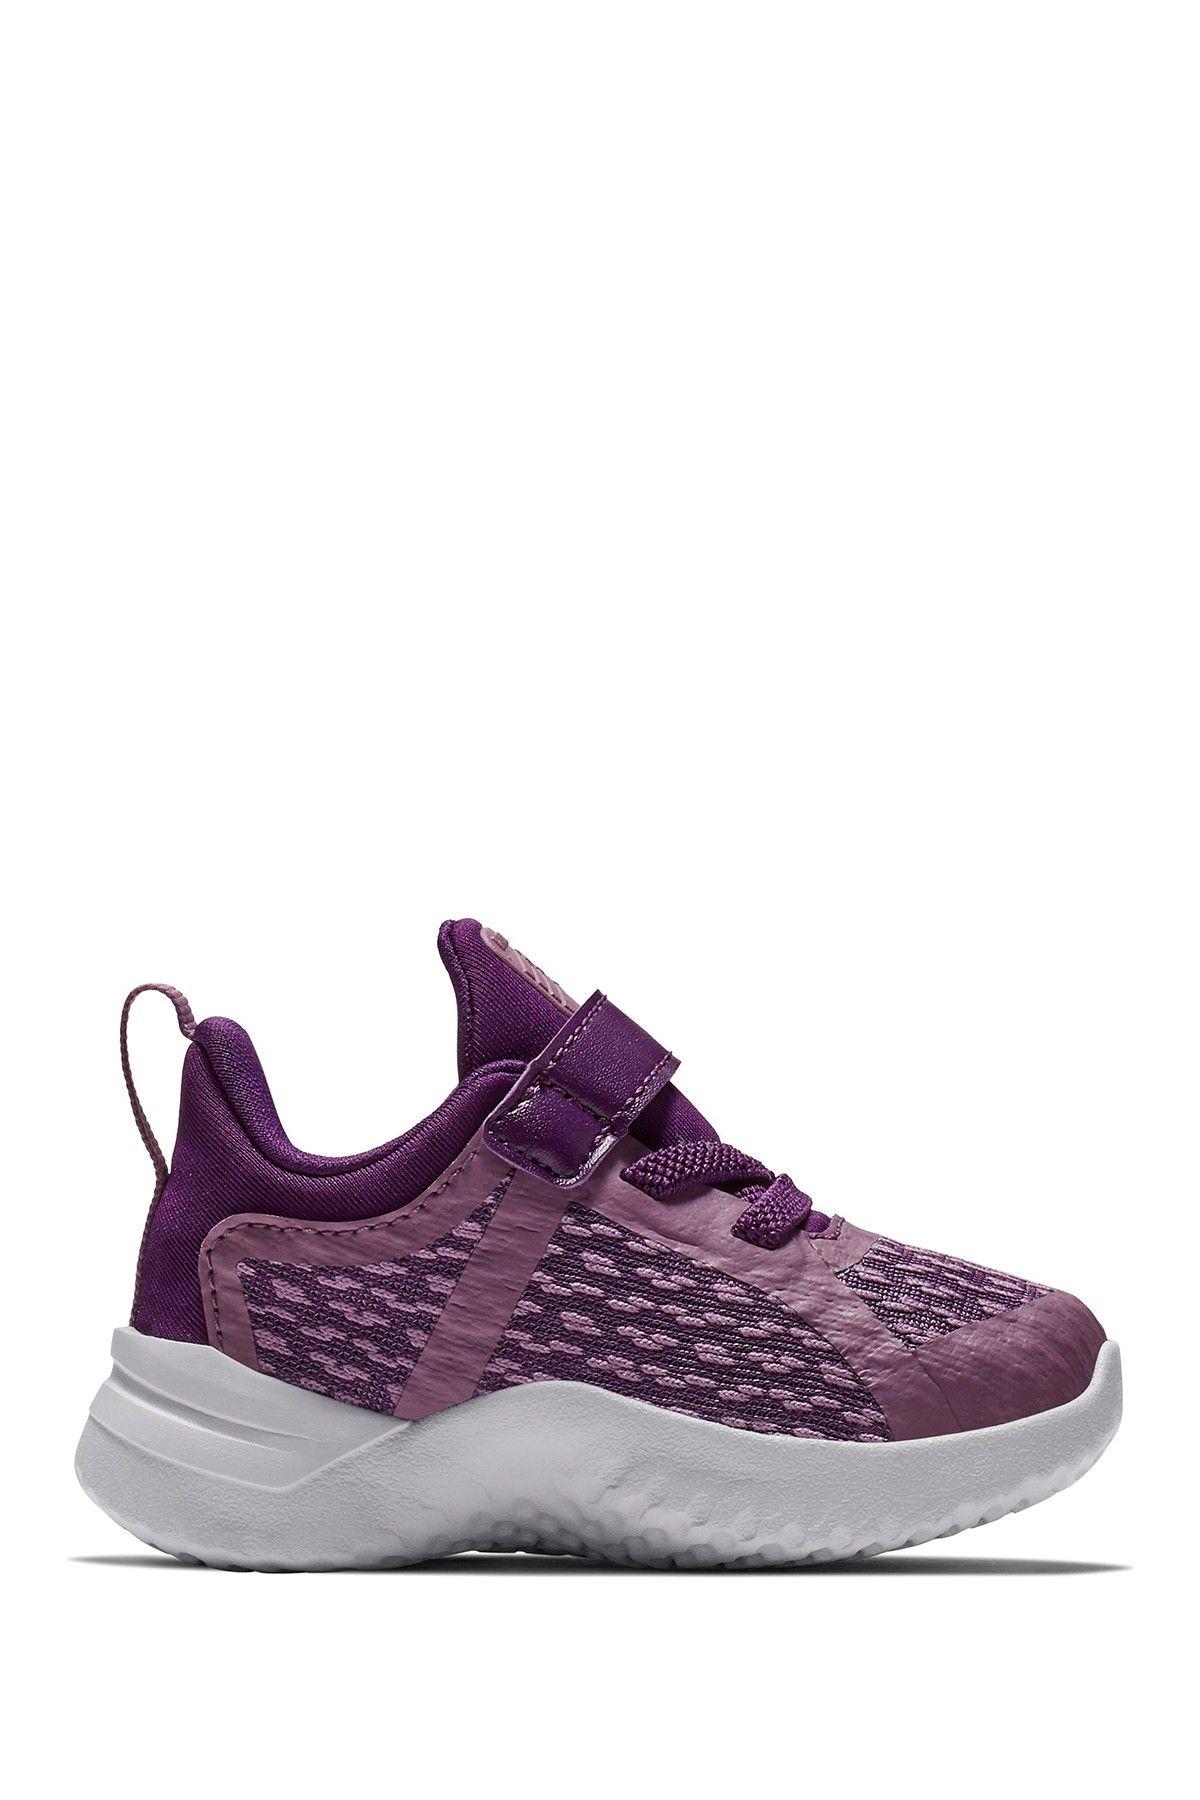 6885bcae56 Rival Sneaker (Baby & Toddler) | Kid's shoes | Baby sneakers, Nike ...